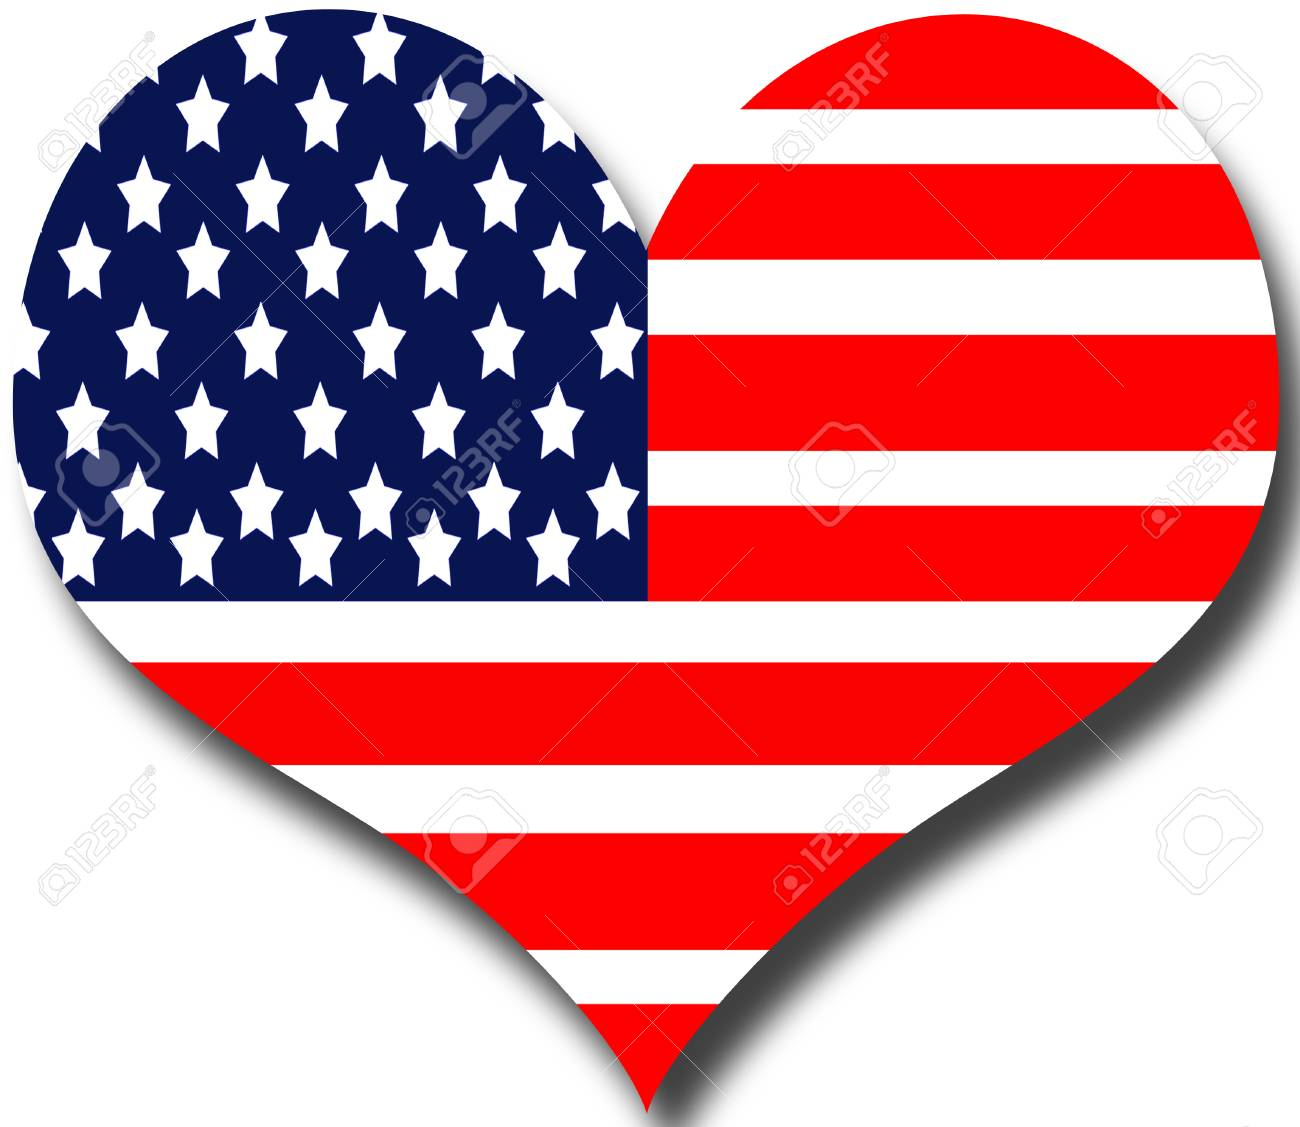 American Flag Heart Clipart.